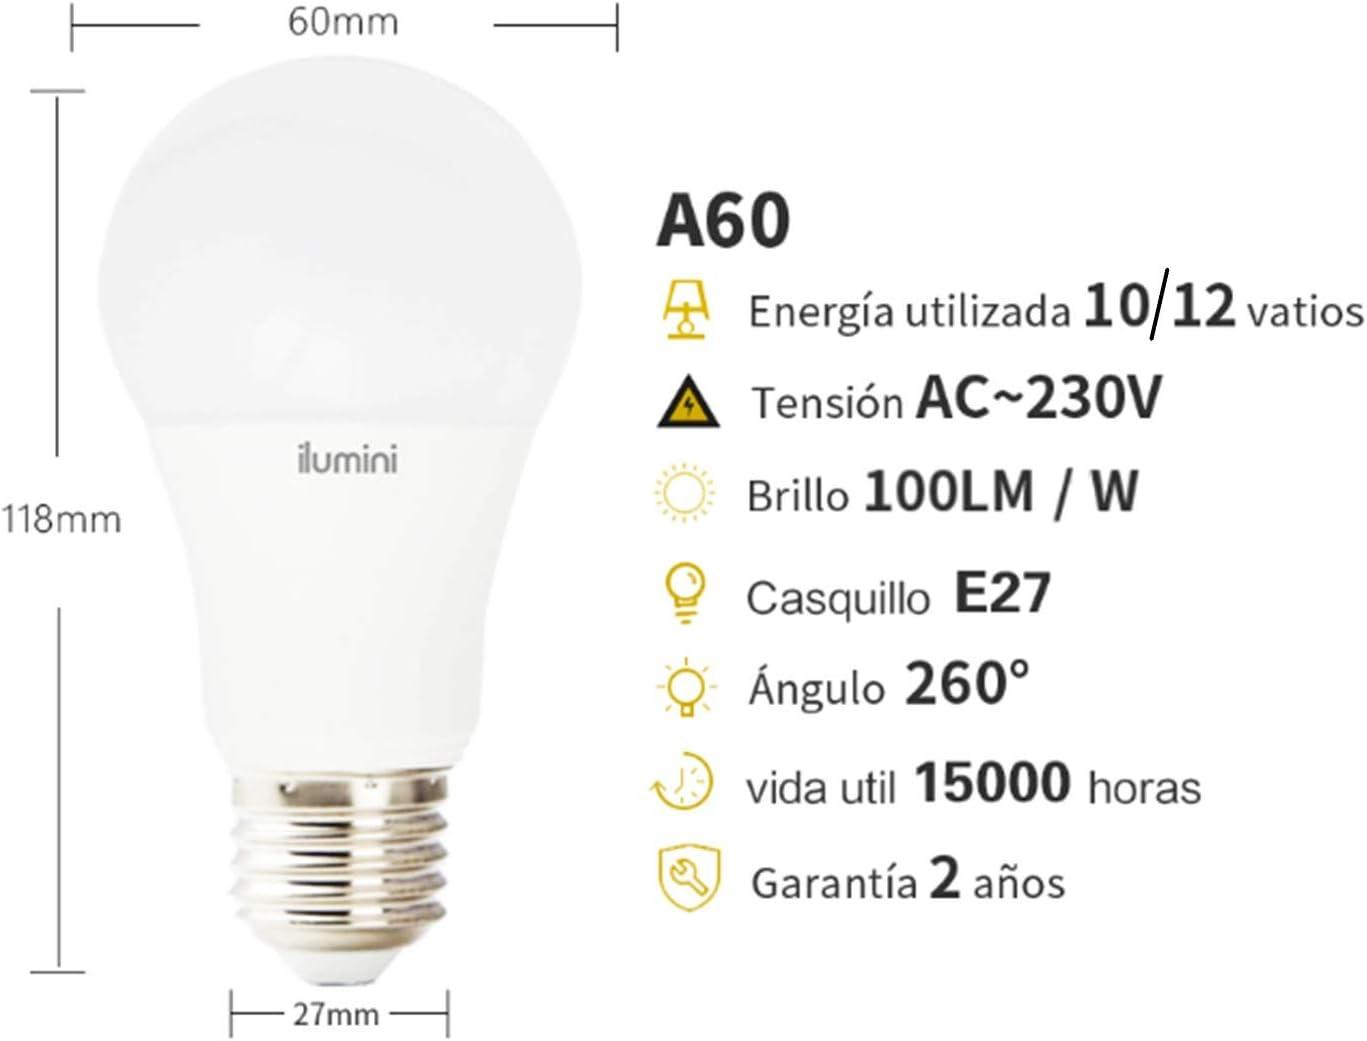 Casquillo E27,10W equivalente a 70w 950 L/úmenes ilumini Bombillas LED A60 Estand/ár Clase de eficiencia energ/ética A+ 3000K Luz C/álida PACK DE 5